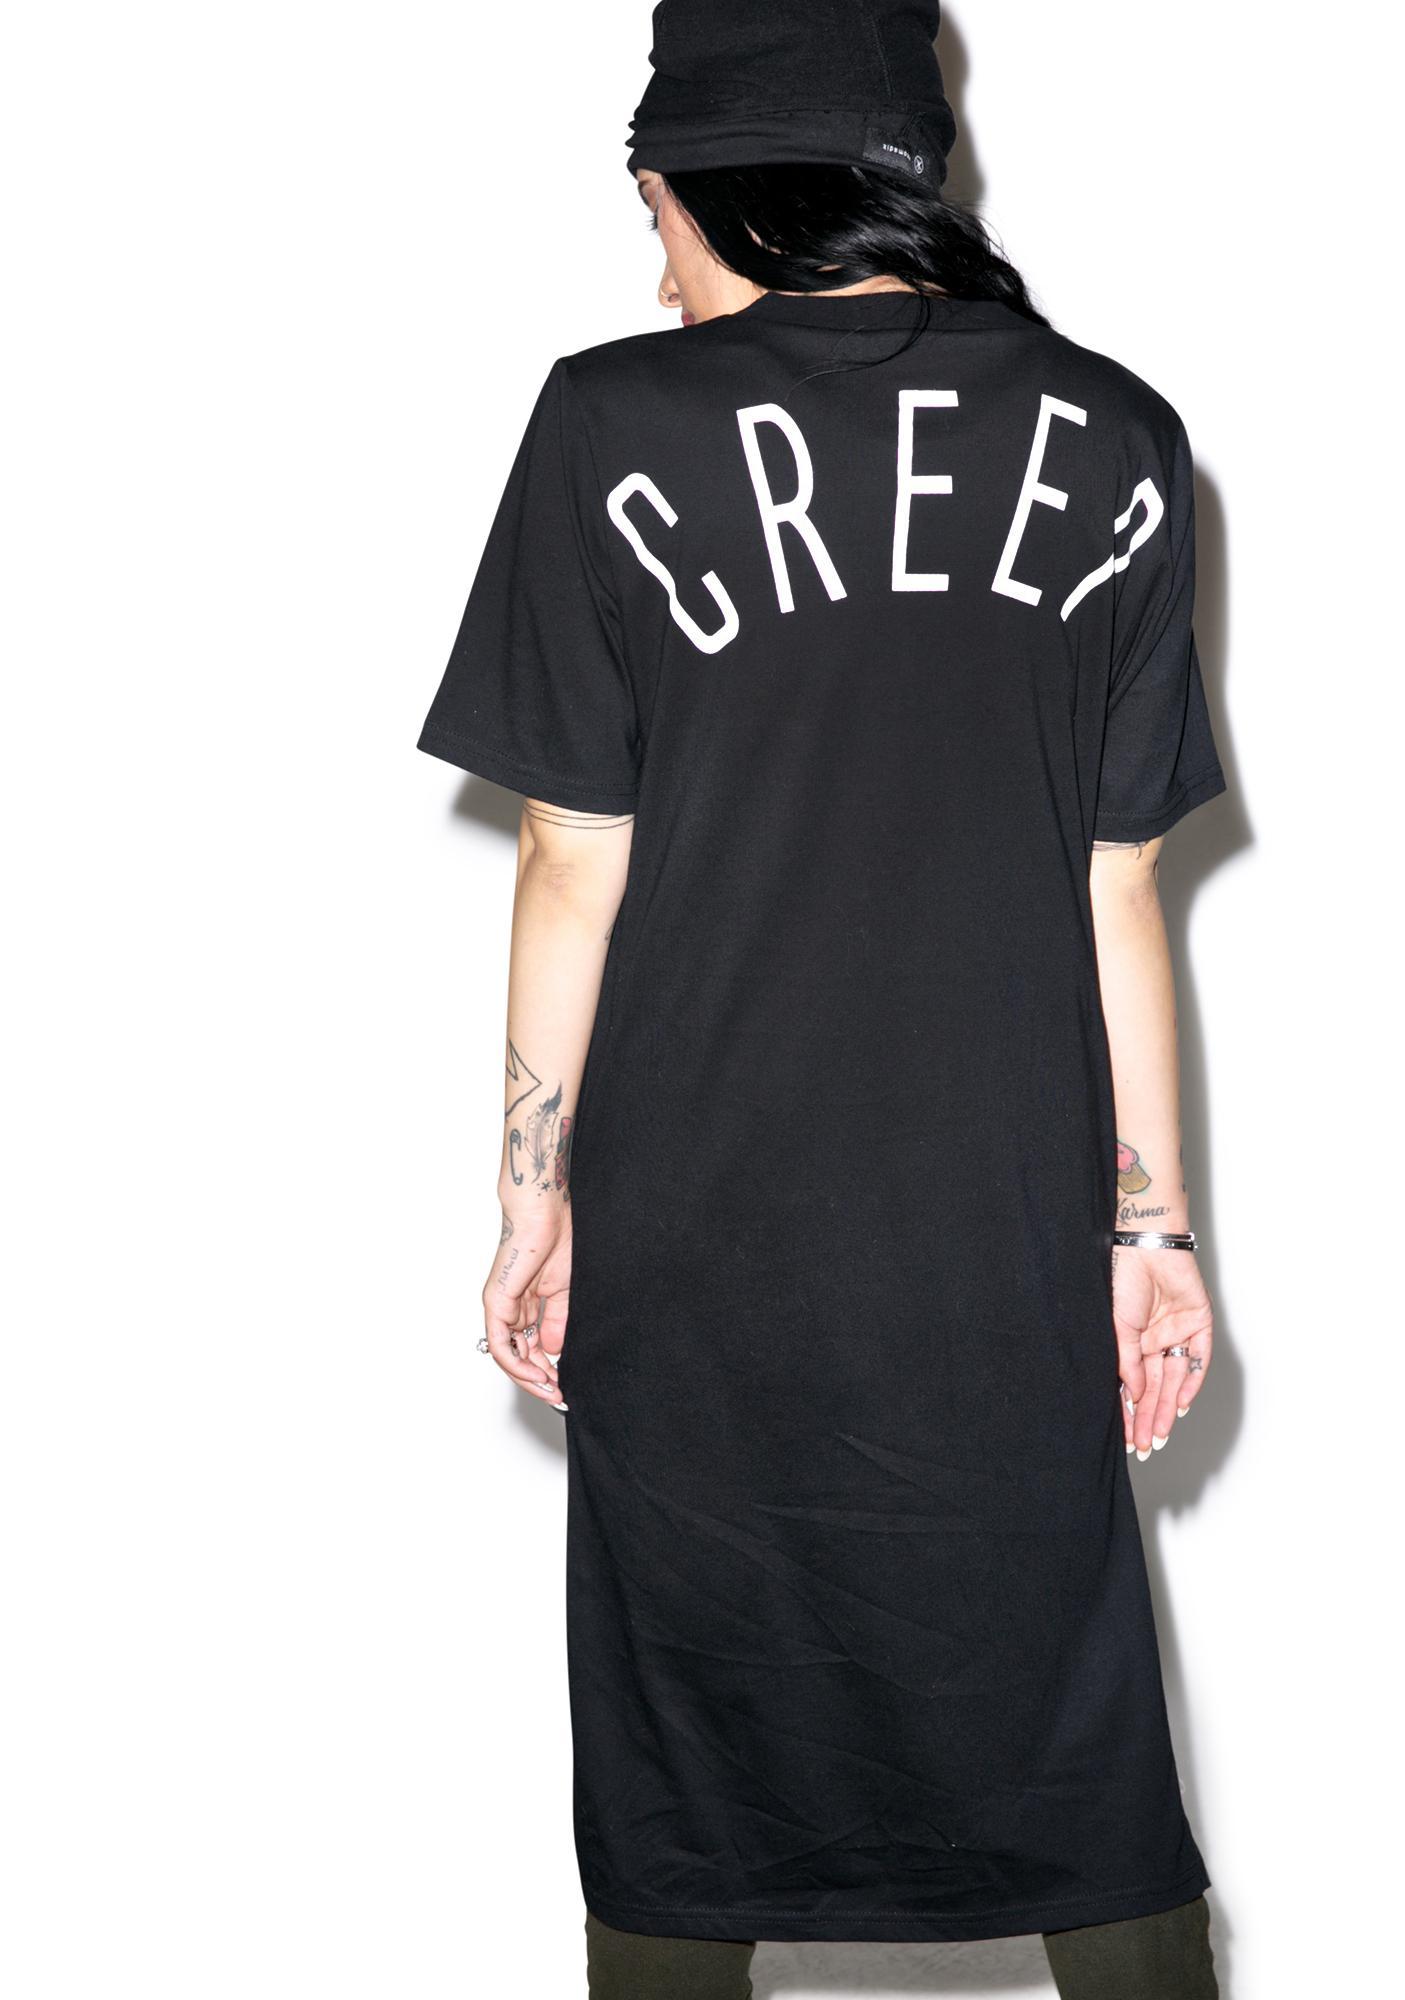 Nightwalker Creep Tee Dress